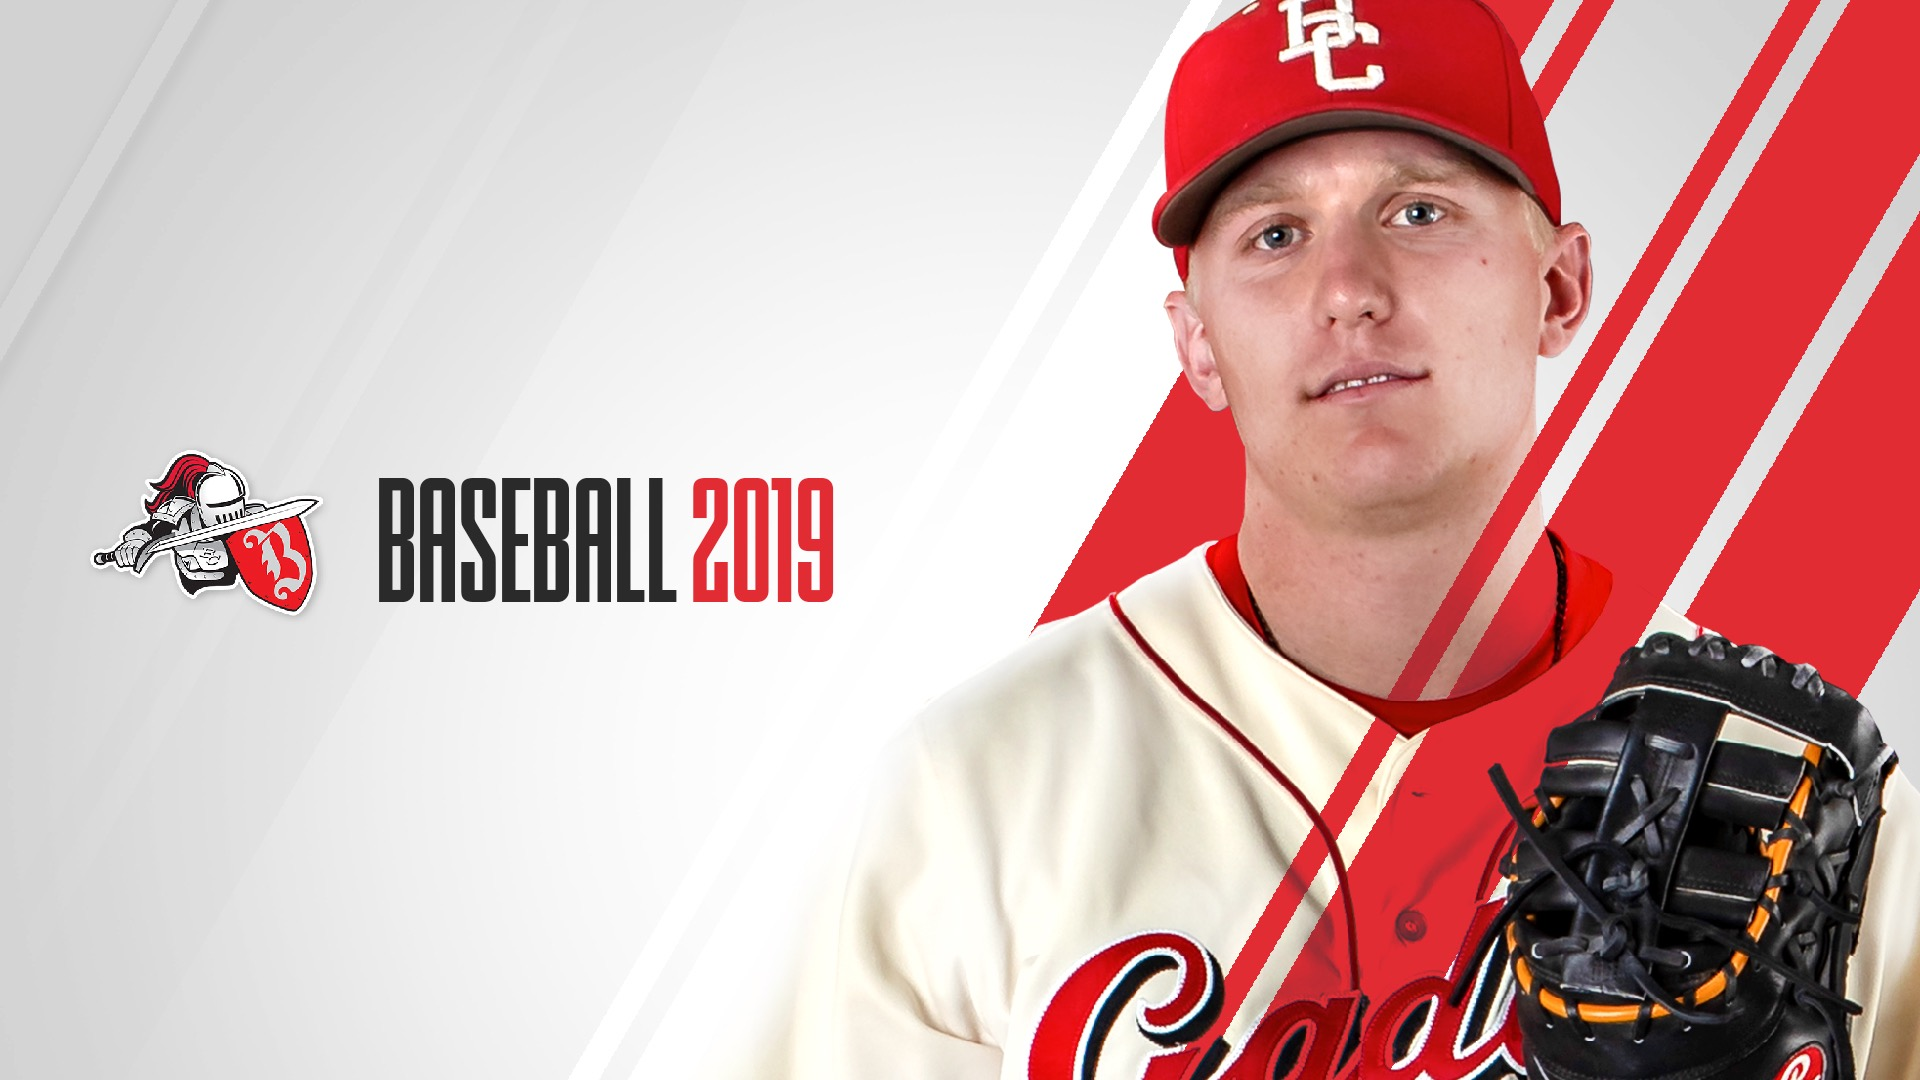 Baseball 2019 Promo Photo